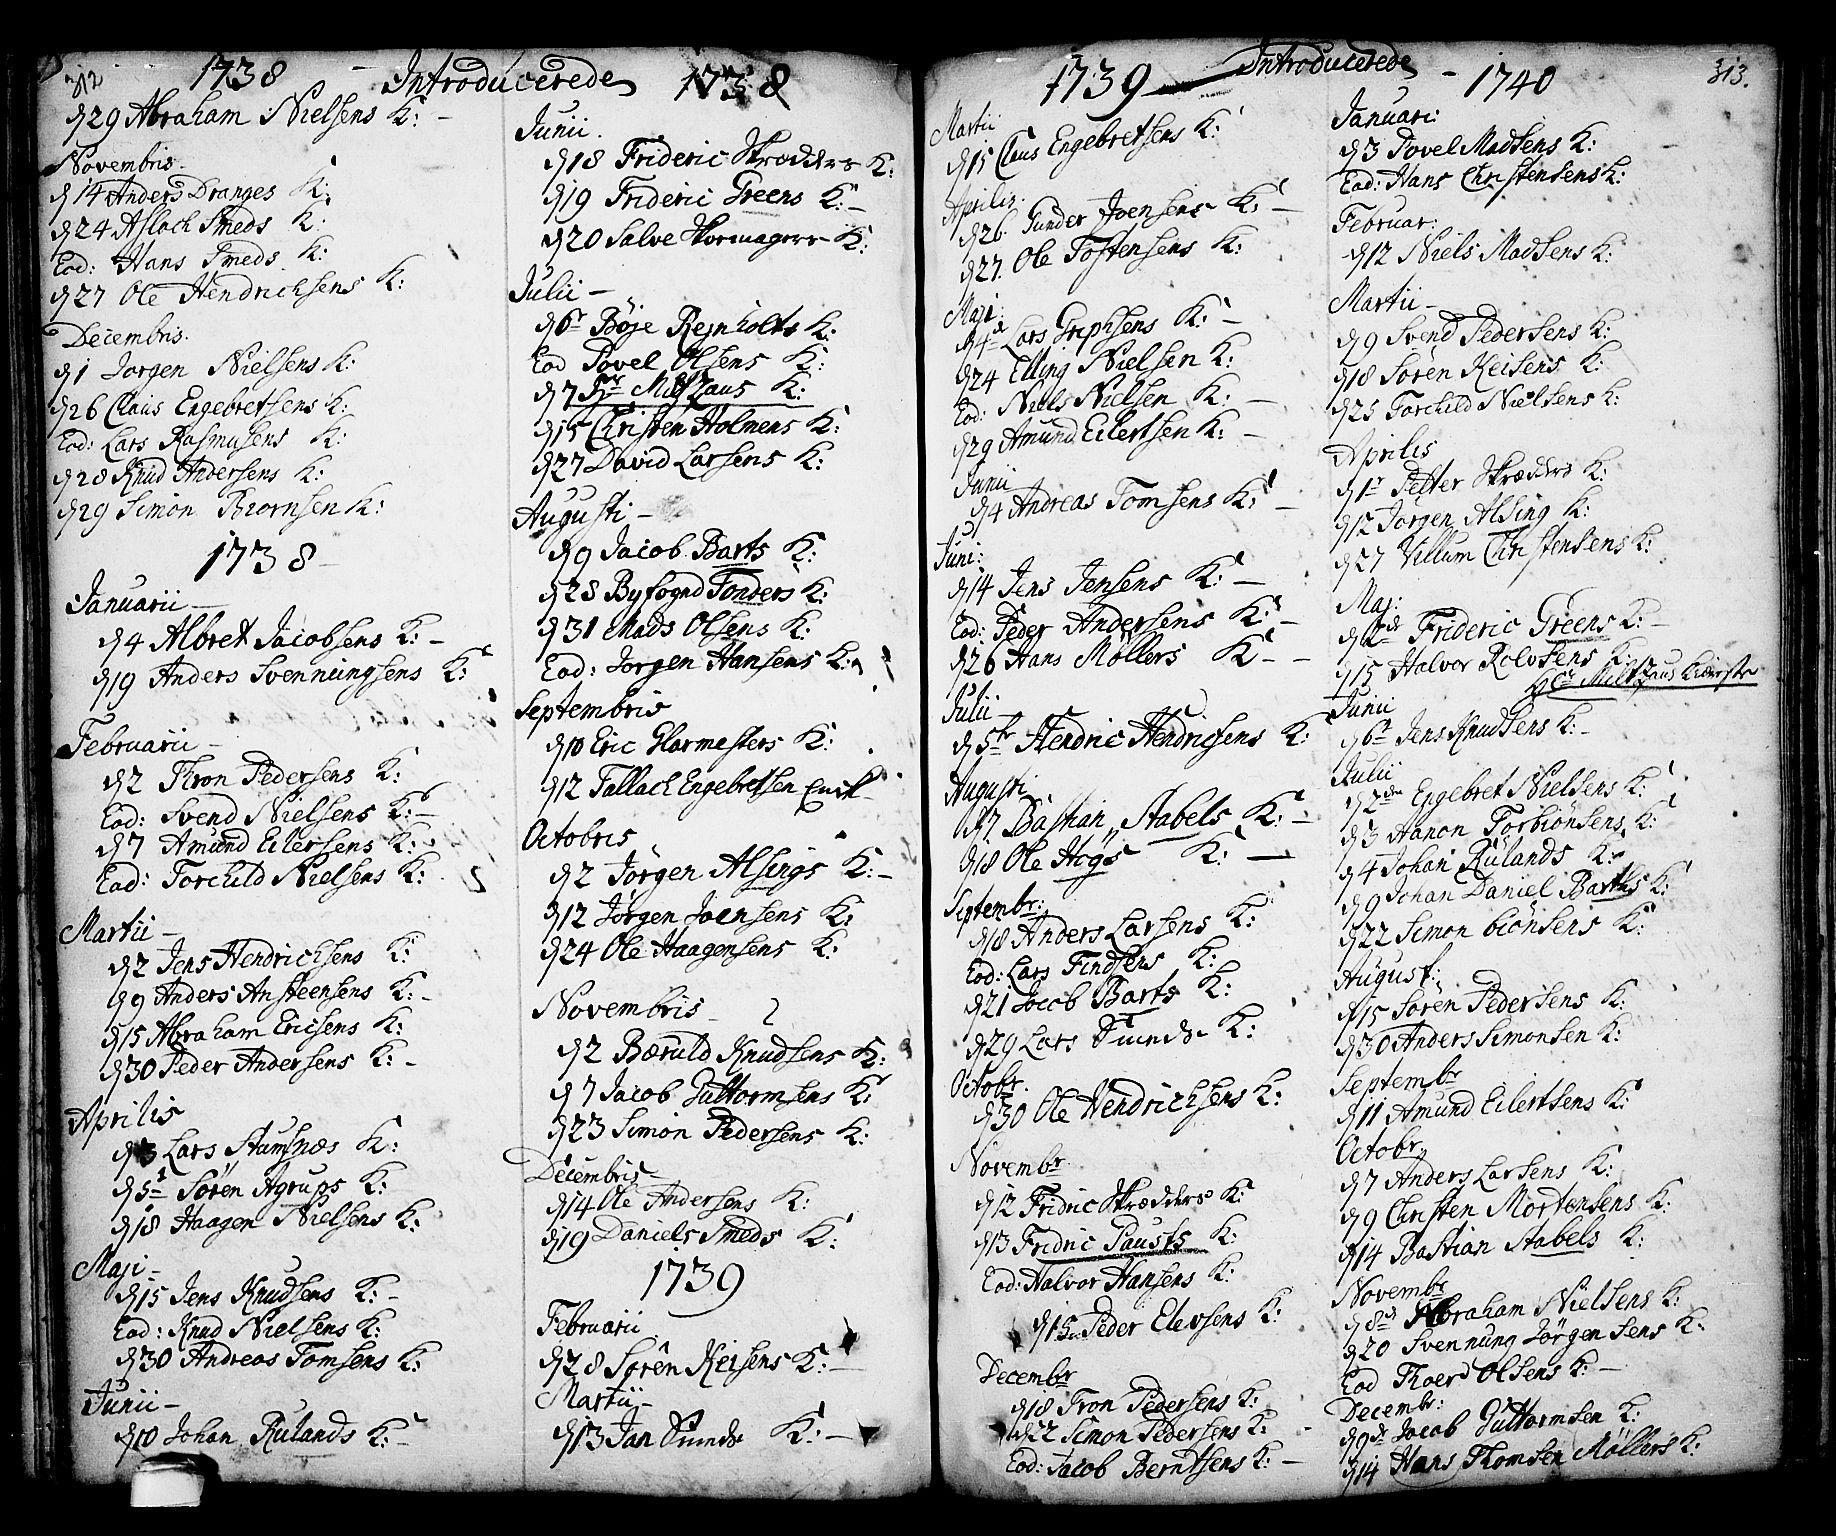 SAKO, Kragerø kirkebøker, F/Fa/L0001: Ministerialbok nr. 1, 1702-1766, s. 312-313